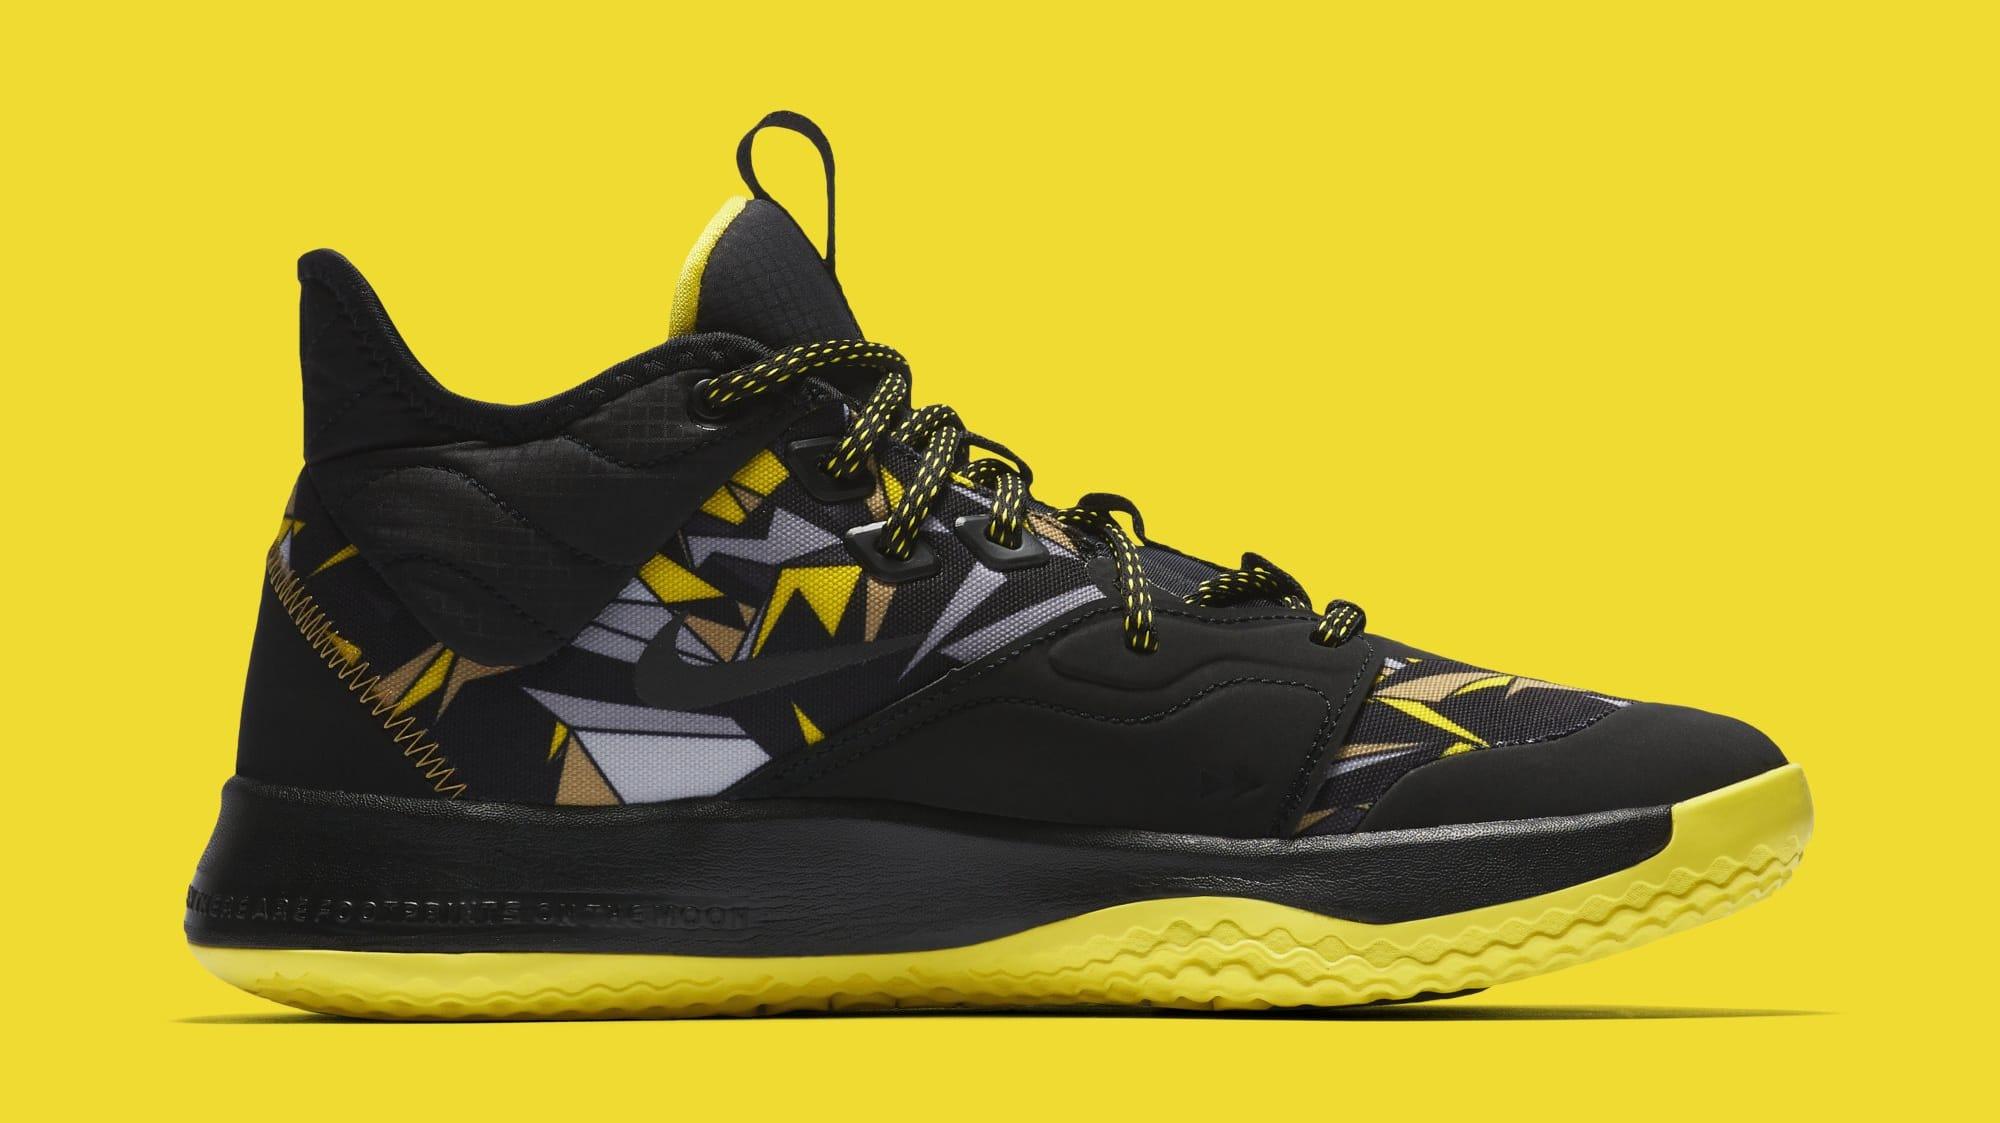 Nike PG 3 'Mamba Mentality' AO2608-900 (Medial)